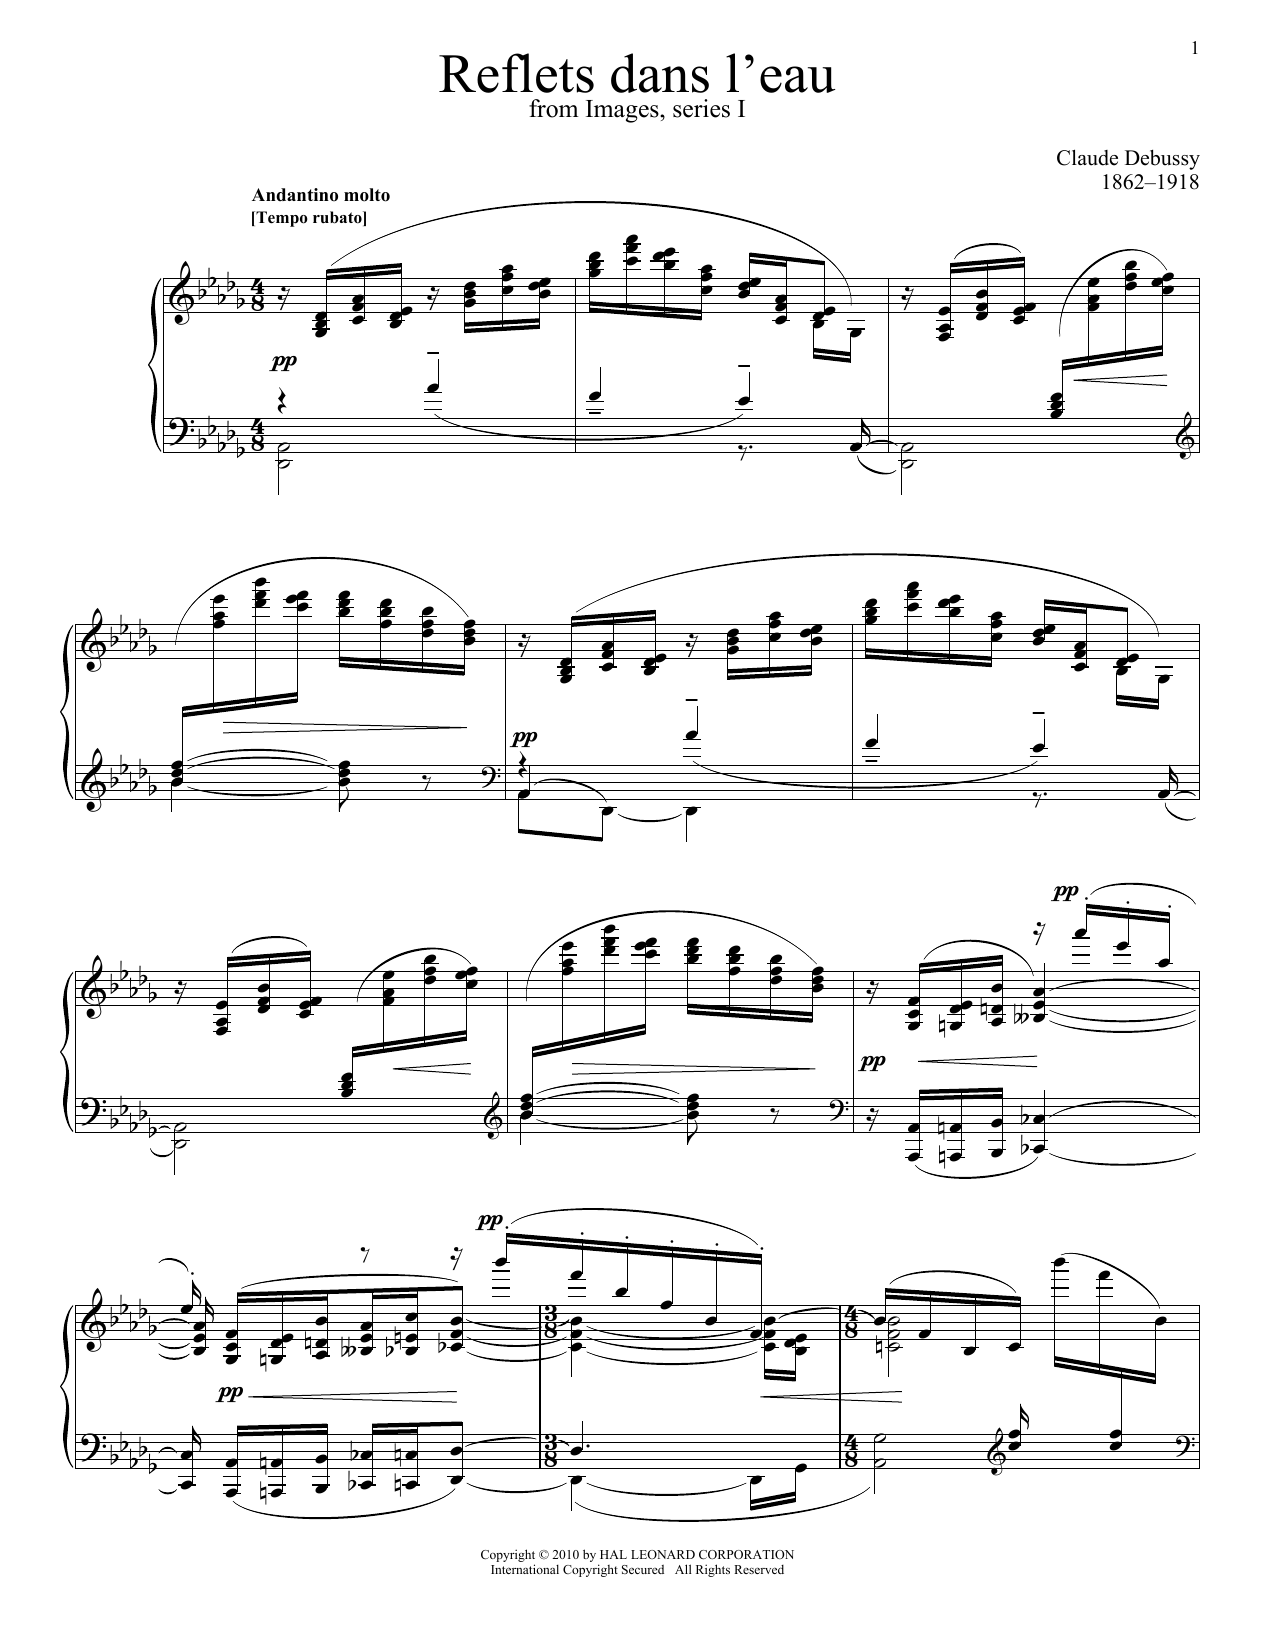 Claude Debussy Reflets Dans L'eau sheet music notes and chords. Download Printable PDF.